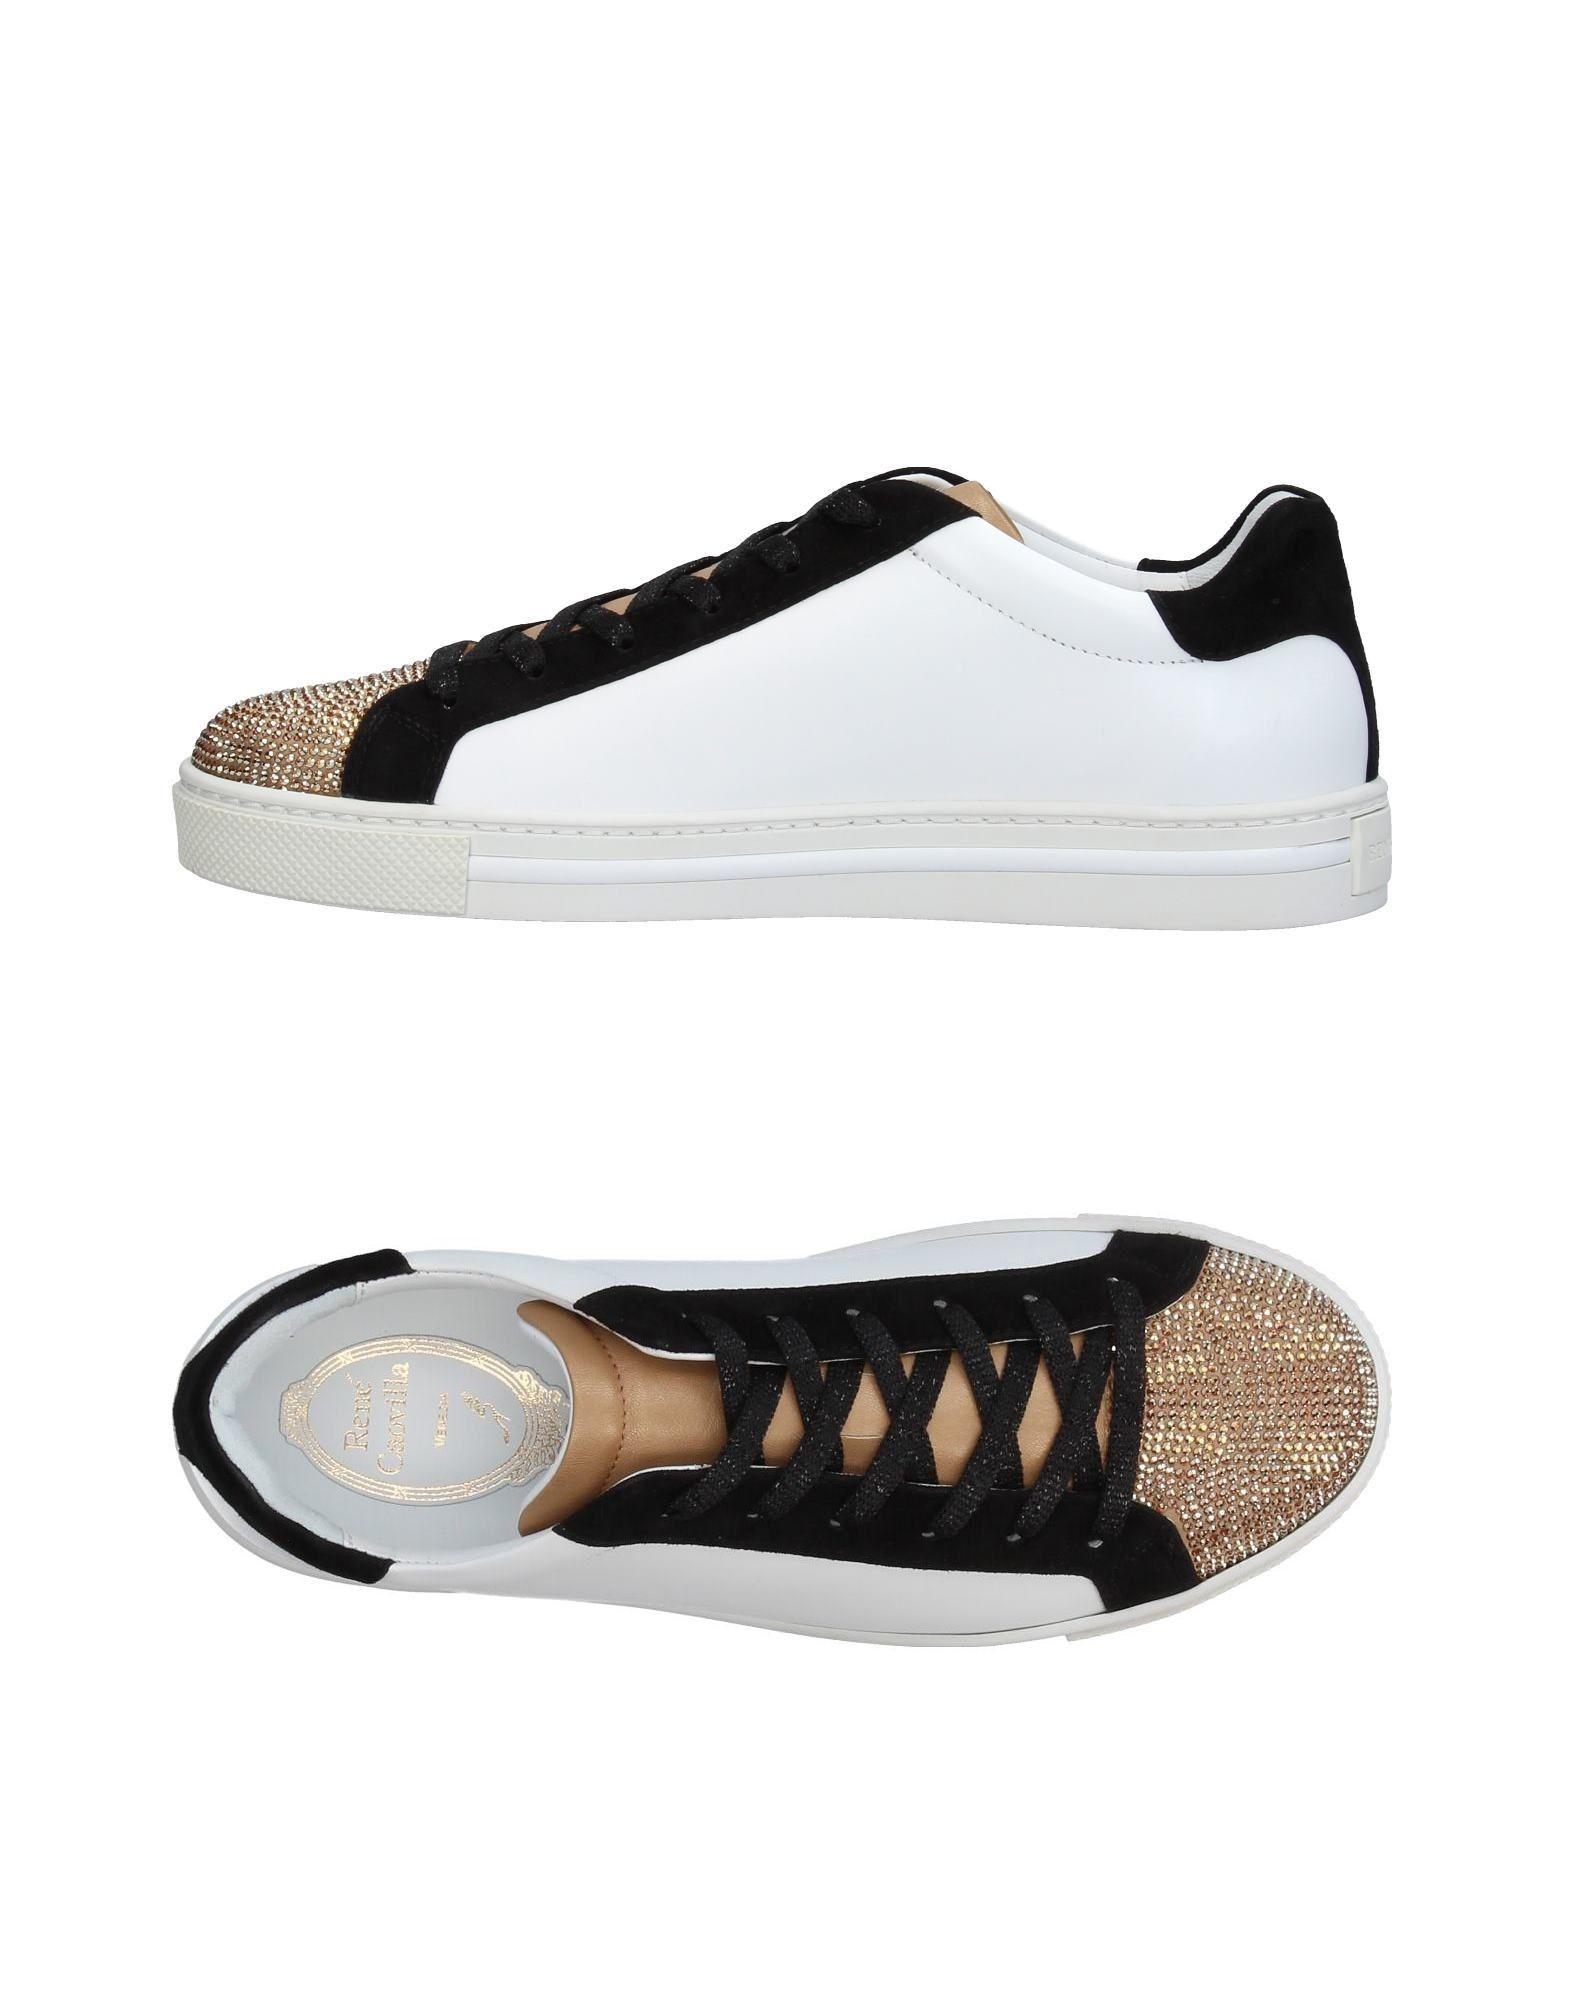 Sneakers Rene Caovilla Femme - Sneakers Rene Caovilla sur